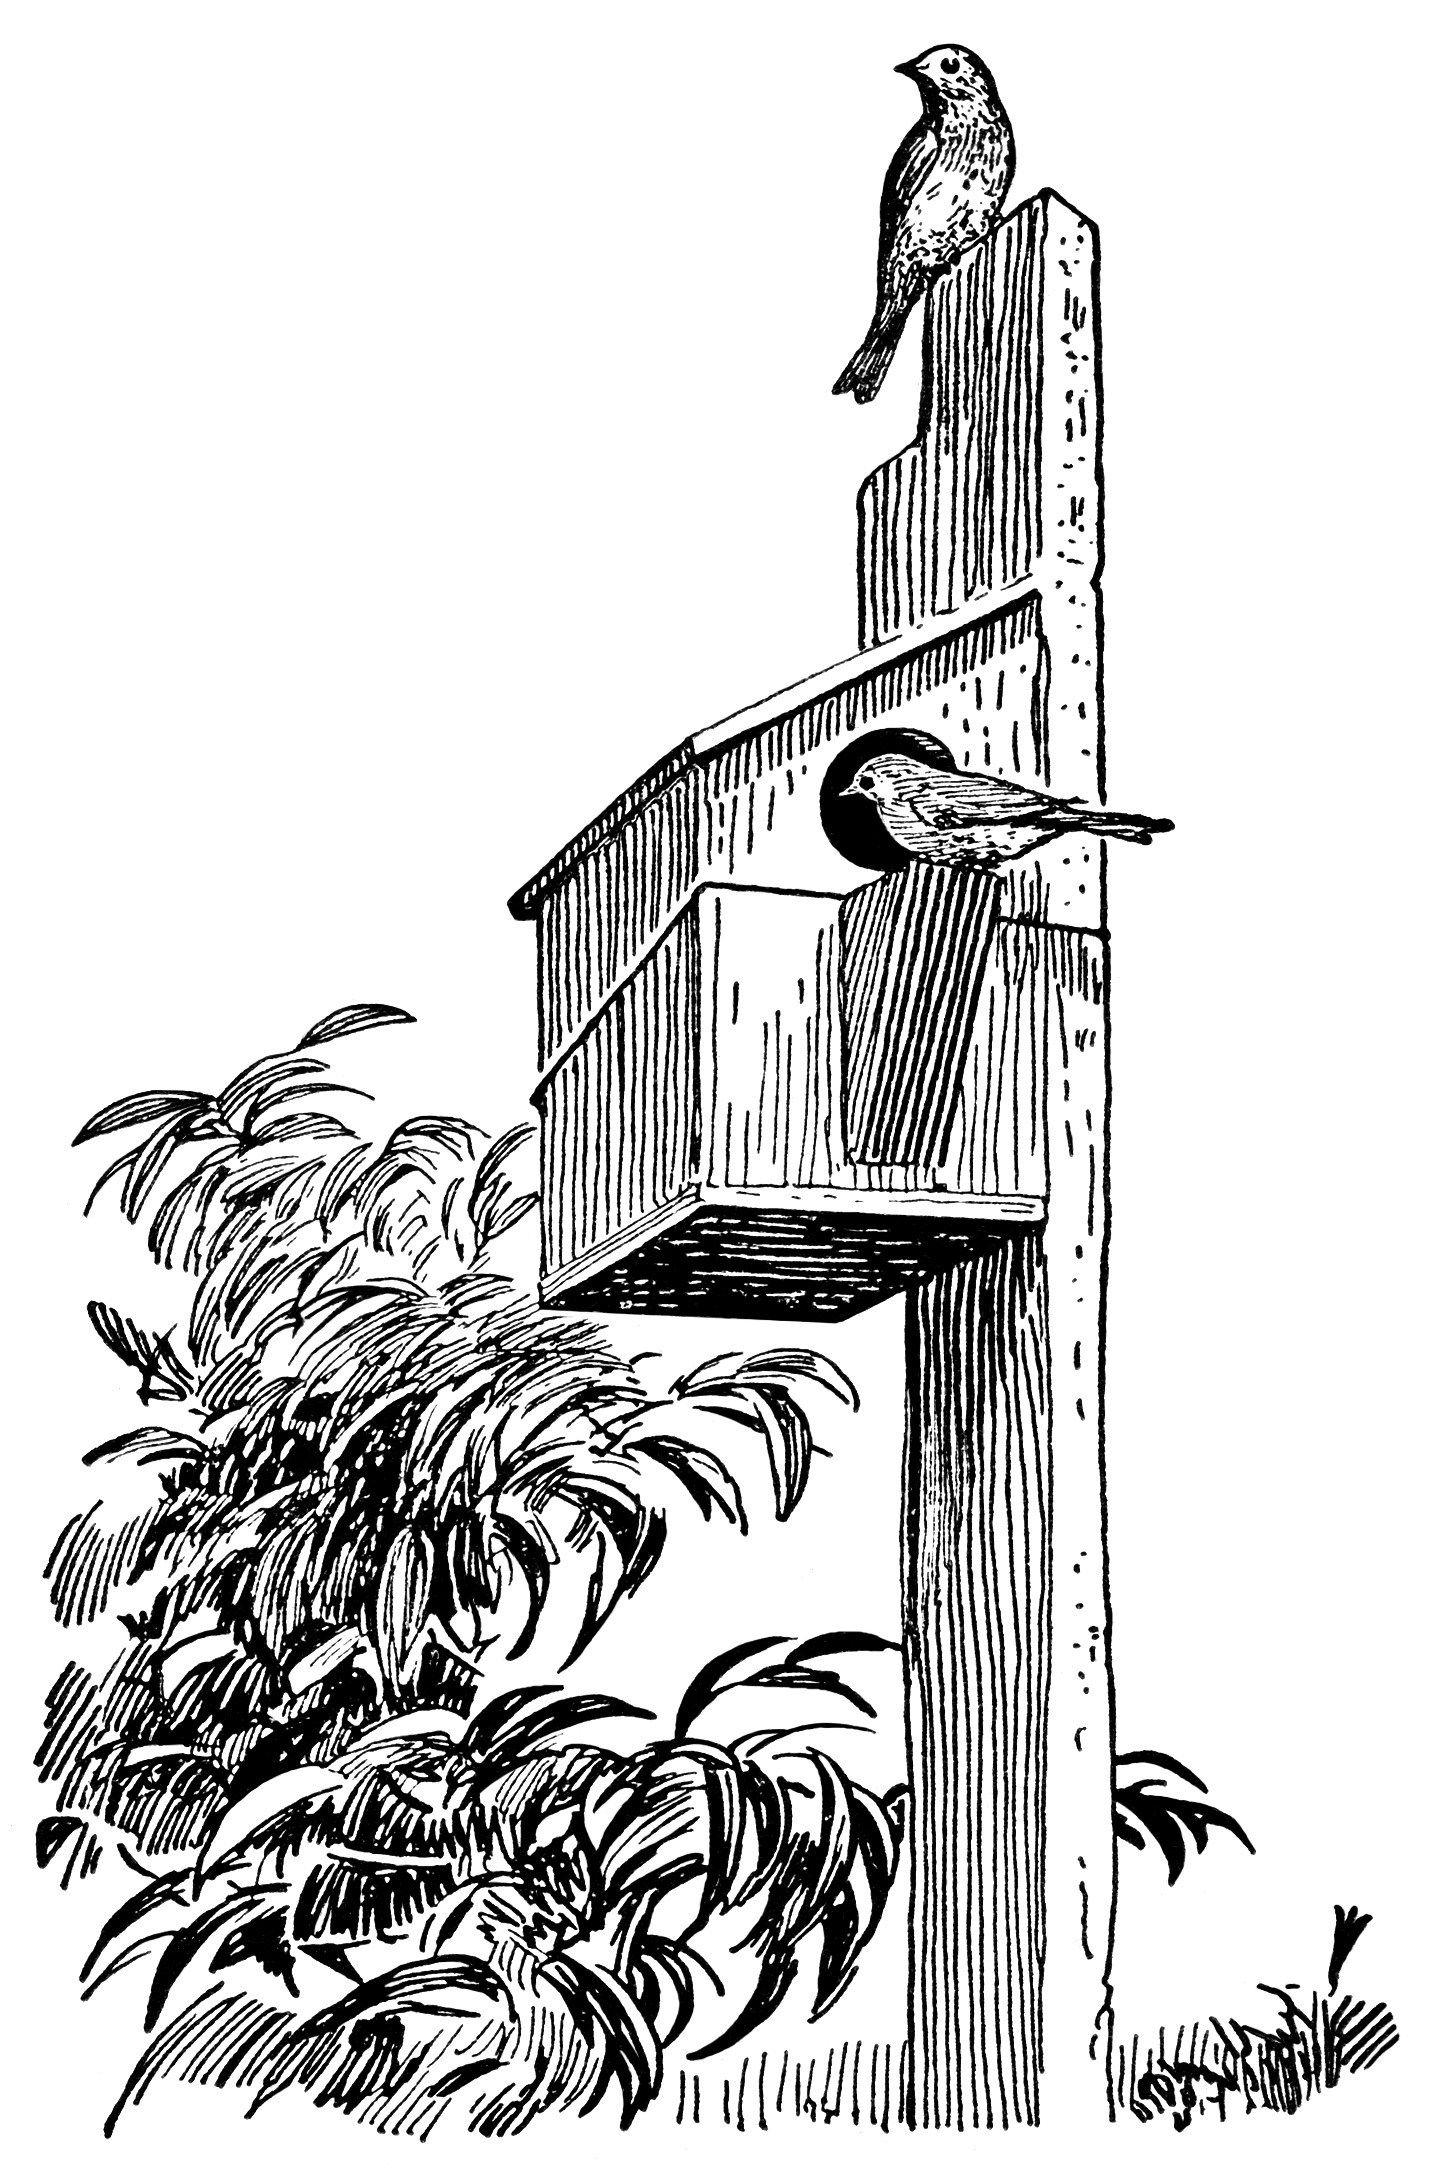 Birdhouse coloring sheet - Vintage Bird Clip Art Black And White Clipart Birdhouse Illustration Free Vintage Bird